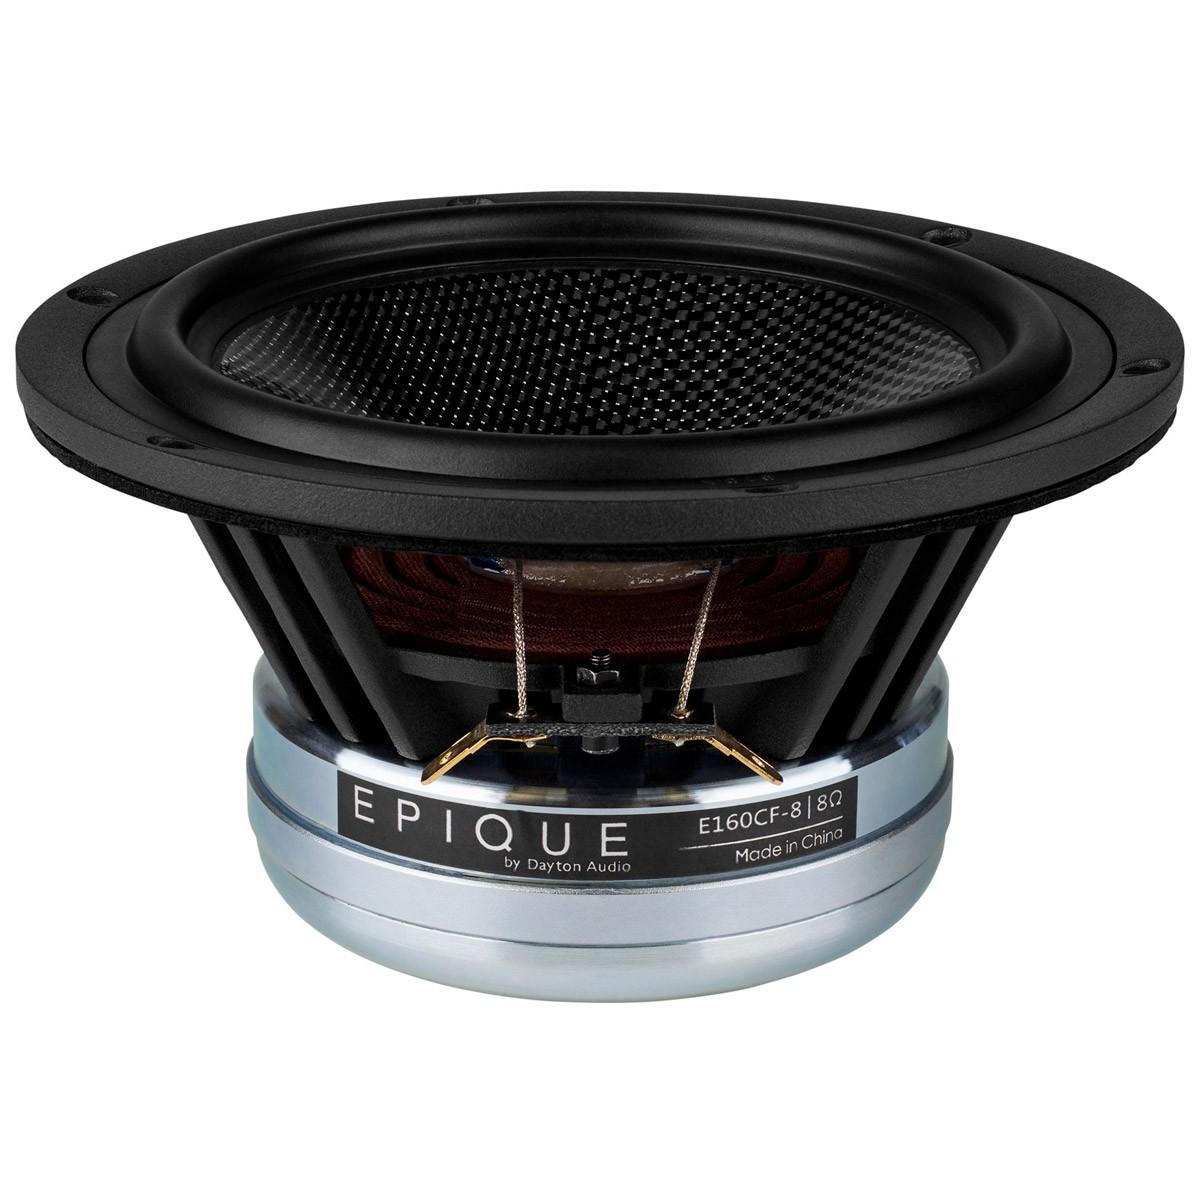 DAYTON AUDIO EPIQUE E160CF-8 Speaker Driver Woofer Carbon Fiber 100W 8 Ohm 89dB 50Hz - 8000Hz Ø13.3cm